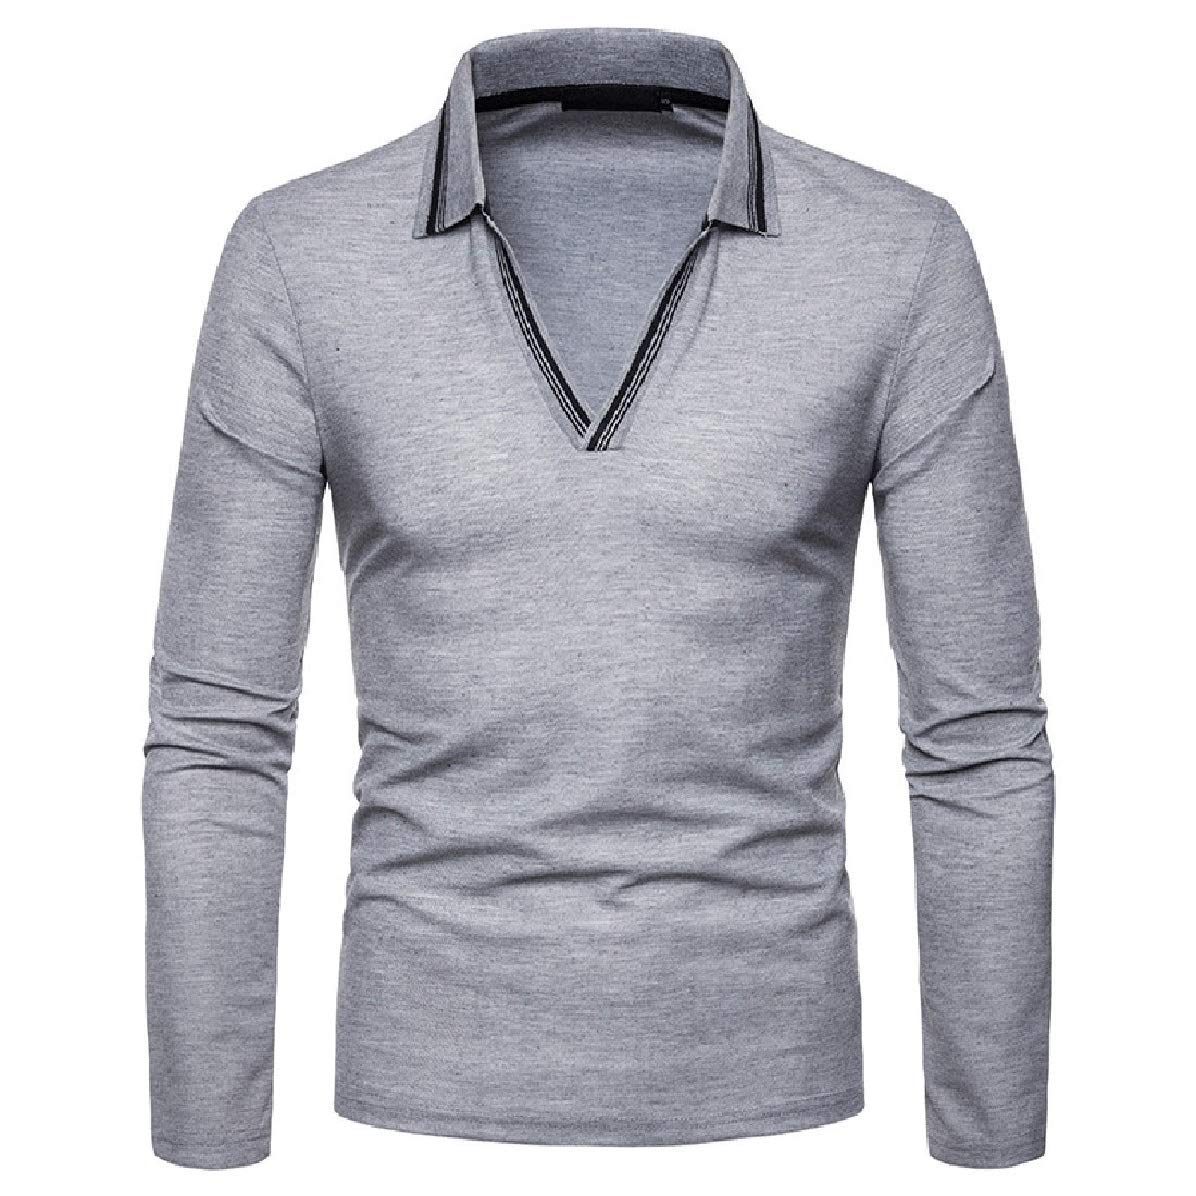 Zimaes-Men Lapel Polo Shirts Plus-Size Pullover Long-Sleeve T-Shirt